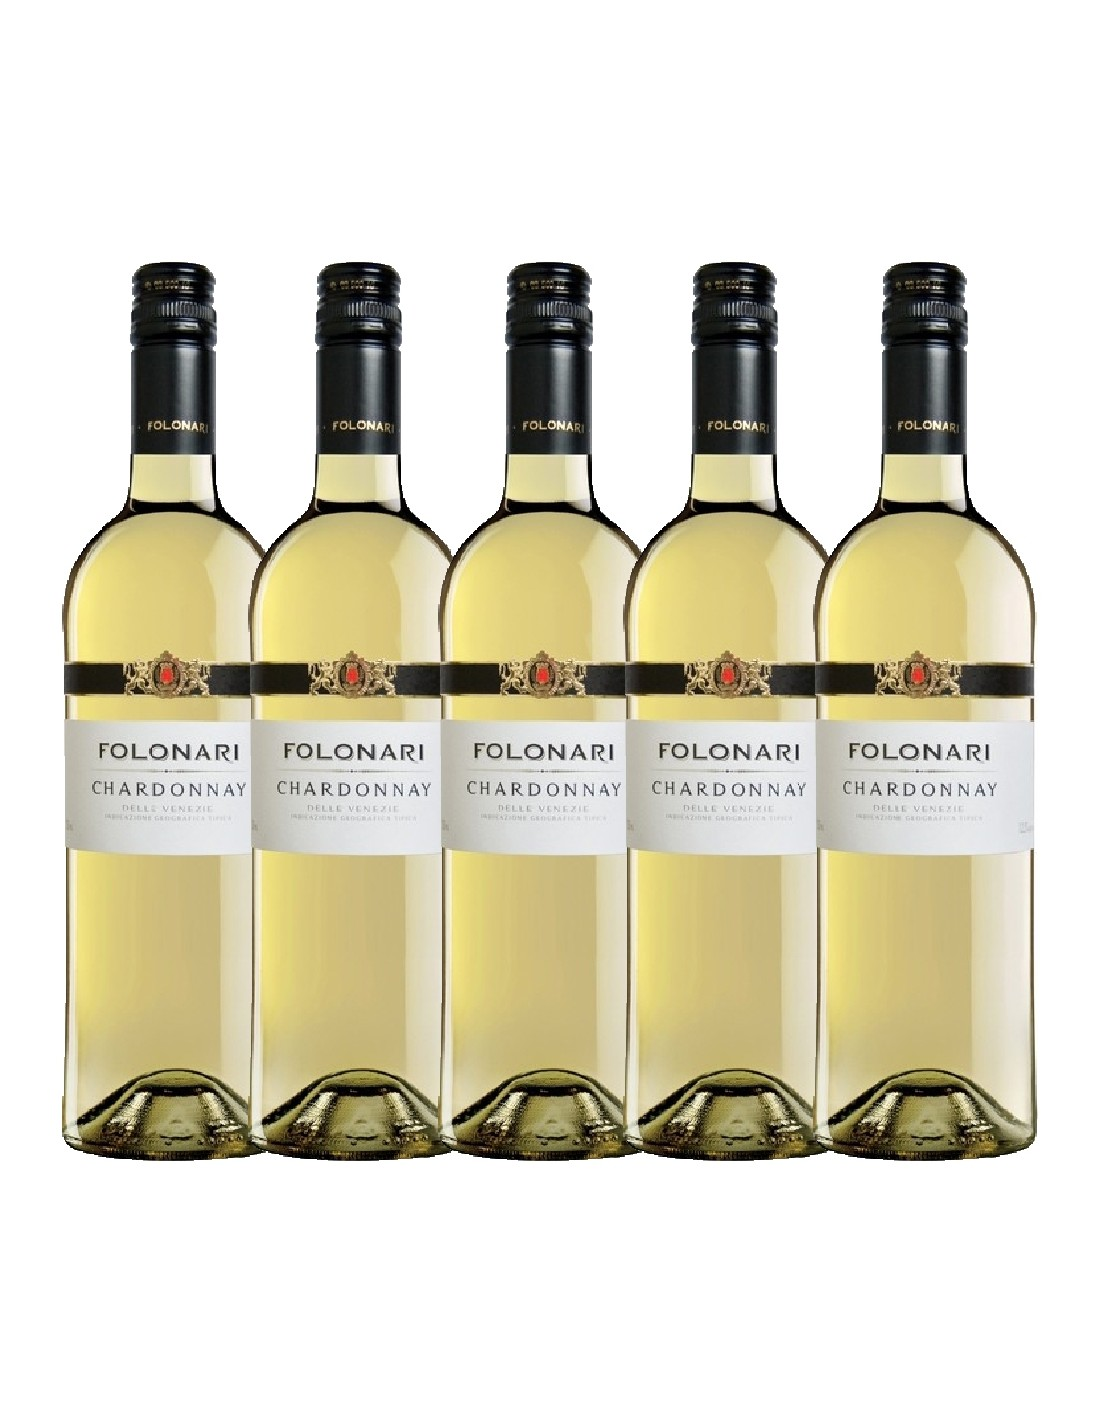 Pachet 5 sticle Vin alb sec, Chardonnay, Folonari Delle Venezie, 0.75L, 12.5% alc., Italia